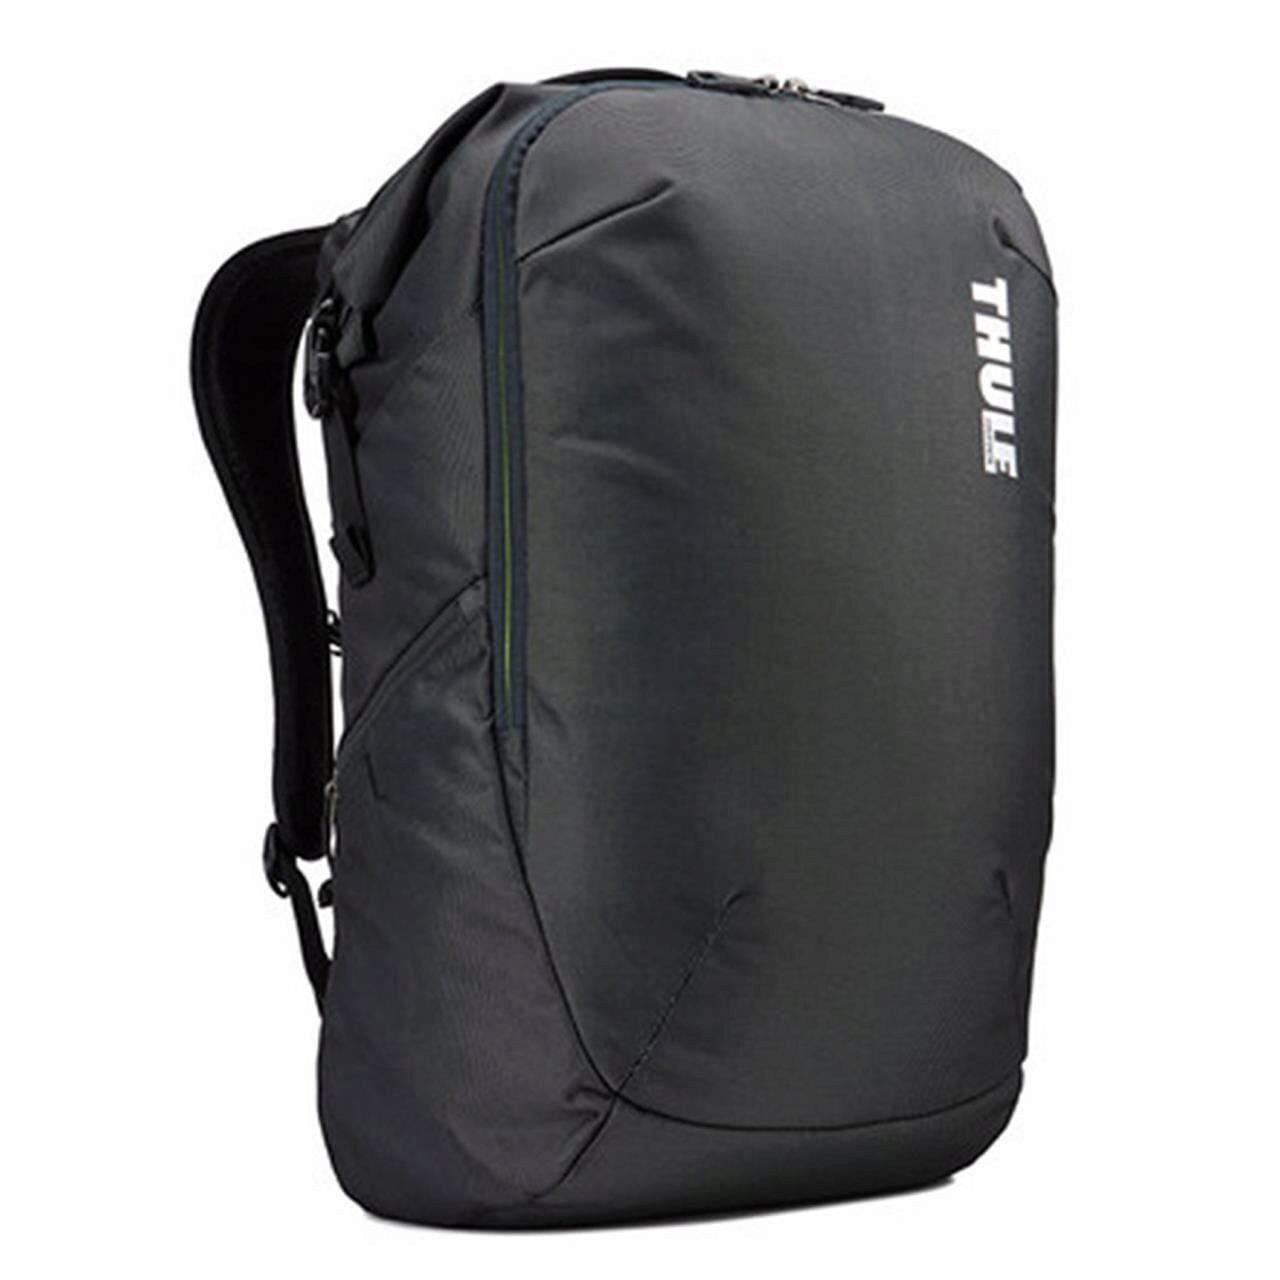 Rucsac urban cu compartiment laptop Thule Subterra Travel Backpack 34L Dark Shadow 1